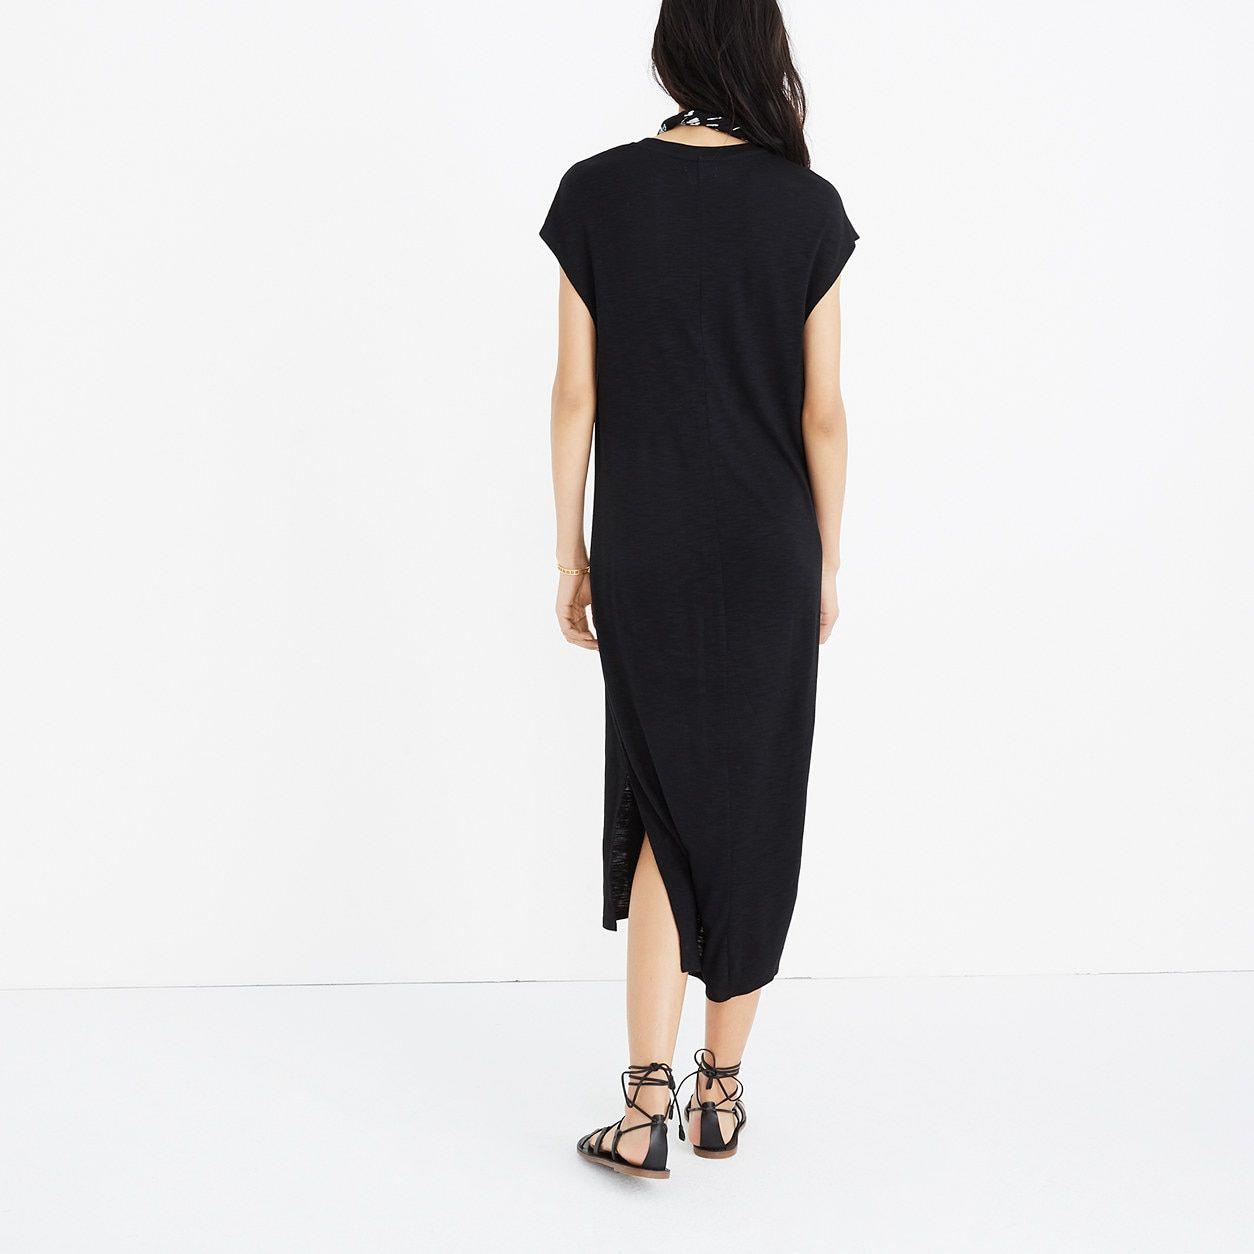 Women S Muscle Midi Dress Midi Dress Dresses Fashion Outfits [ 1254 x 1254 Pixel ]